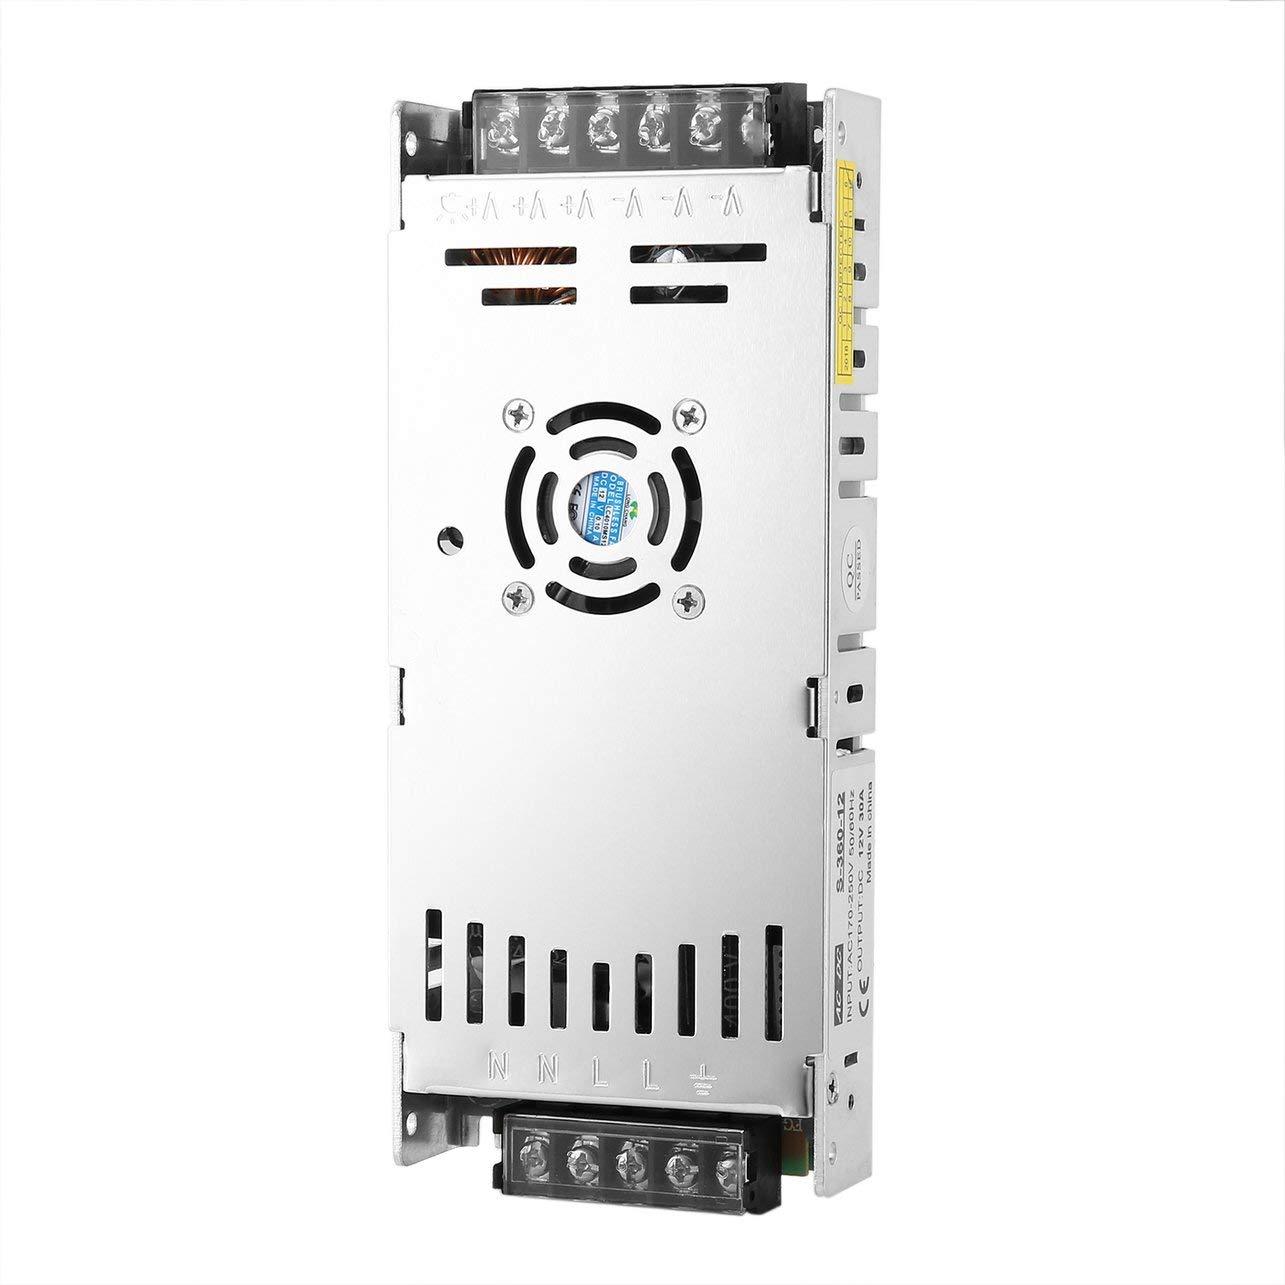 Switching Power Supply,Ultrathin 12V 30A 360W AC-DC Switching Power Supply LED Driver DC Transformer AC170V-250V 50//60Hz for LED Strip Lights